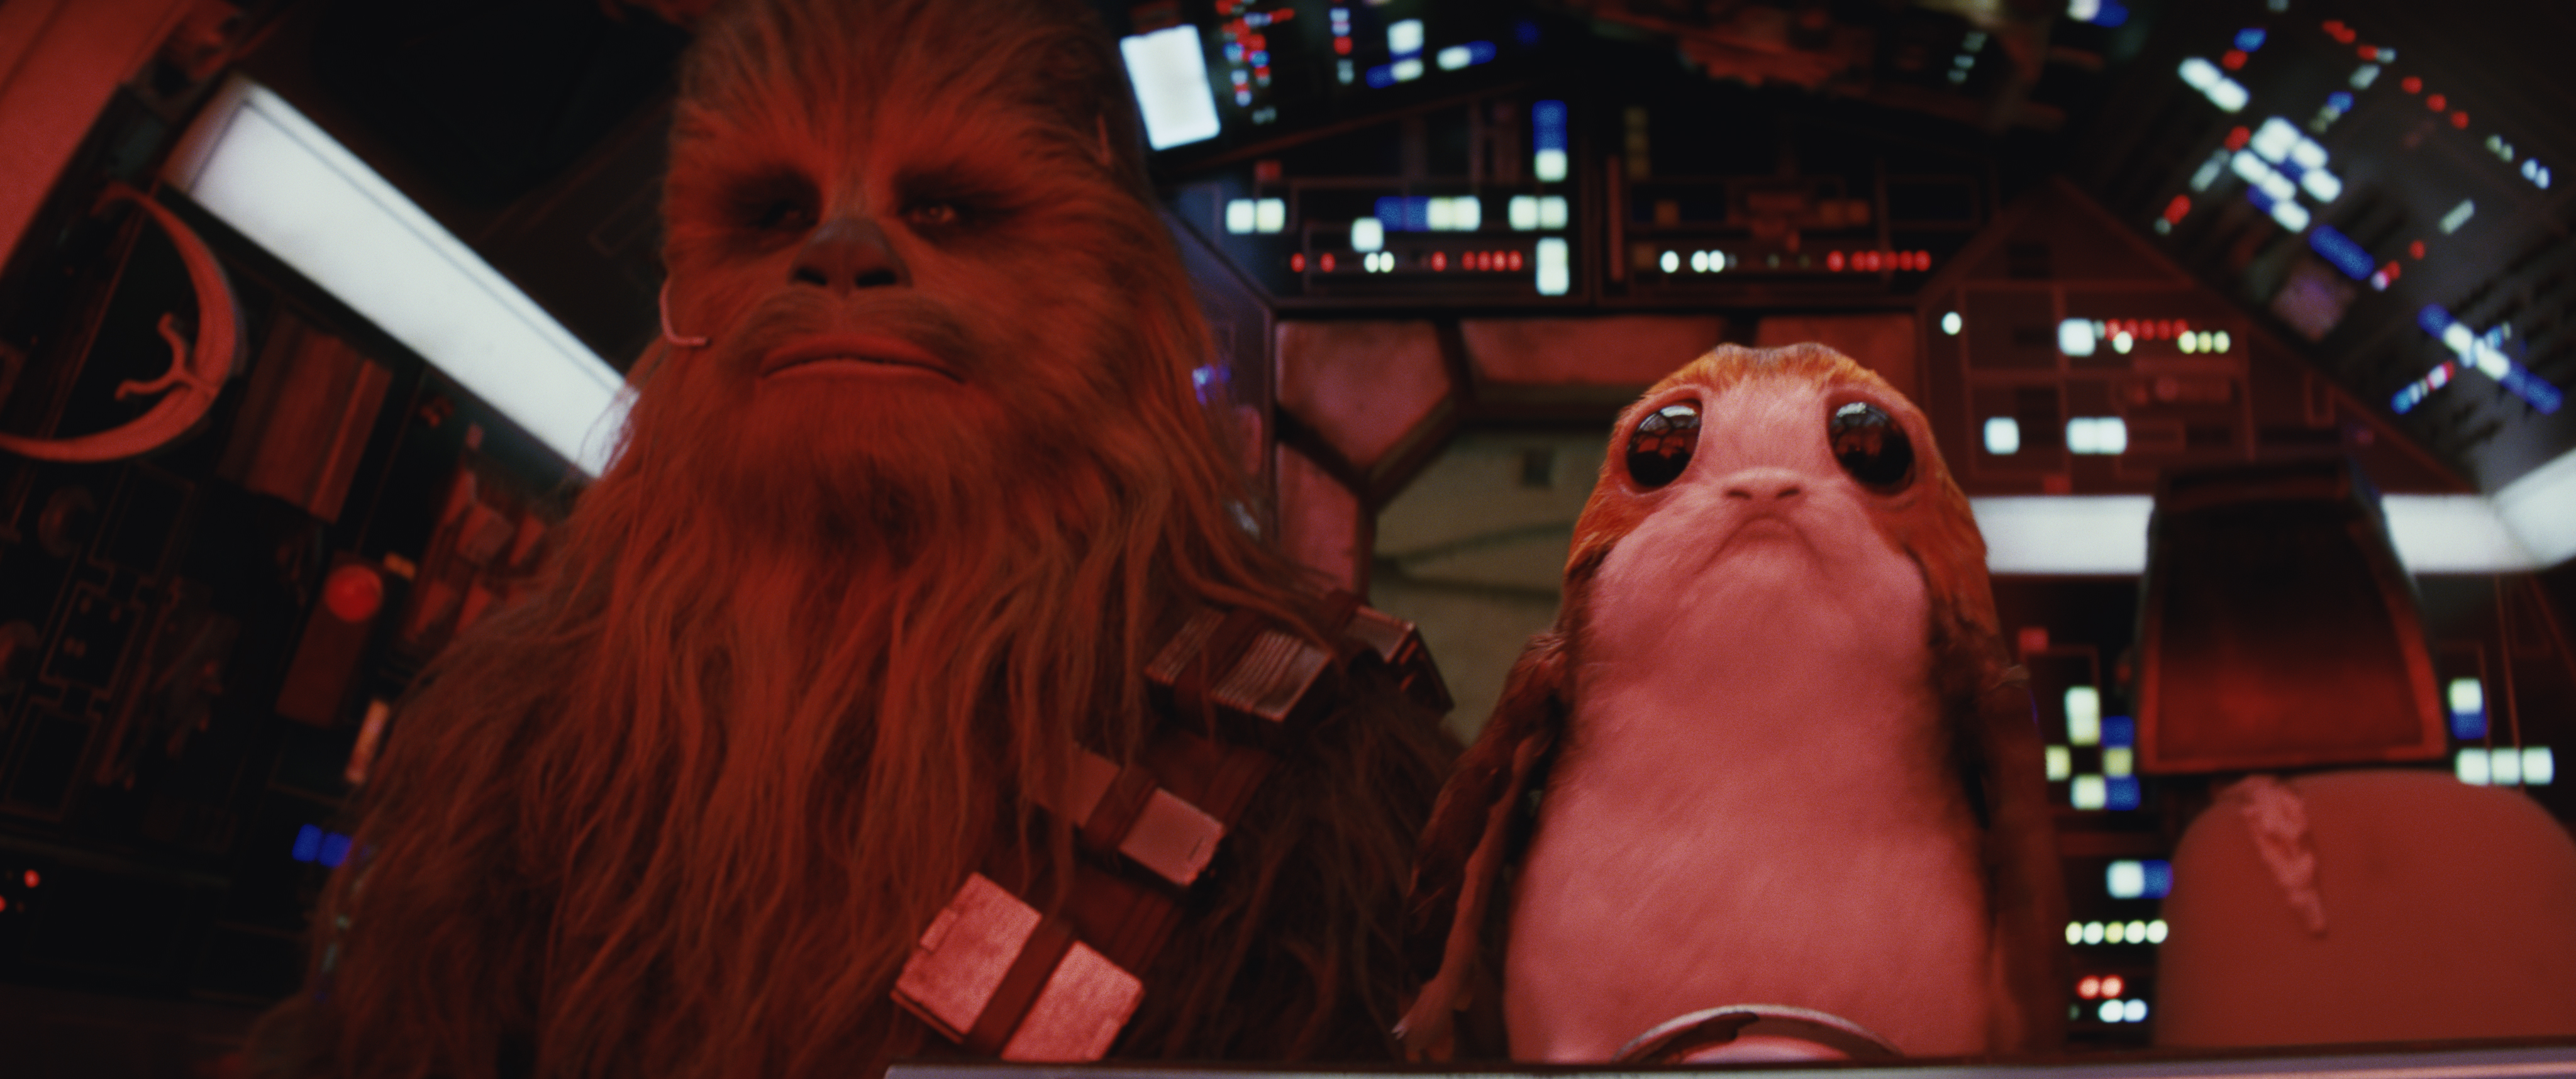 Star_Wars-_The_Last_JediPrintKey_SetWDSMPIEP8-FF-003816